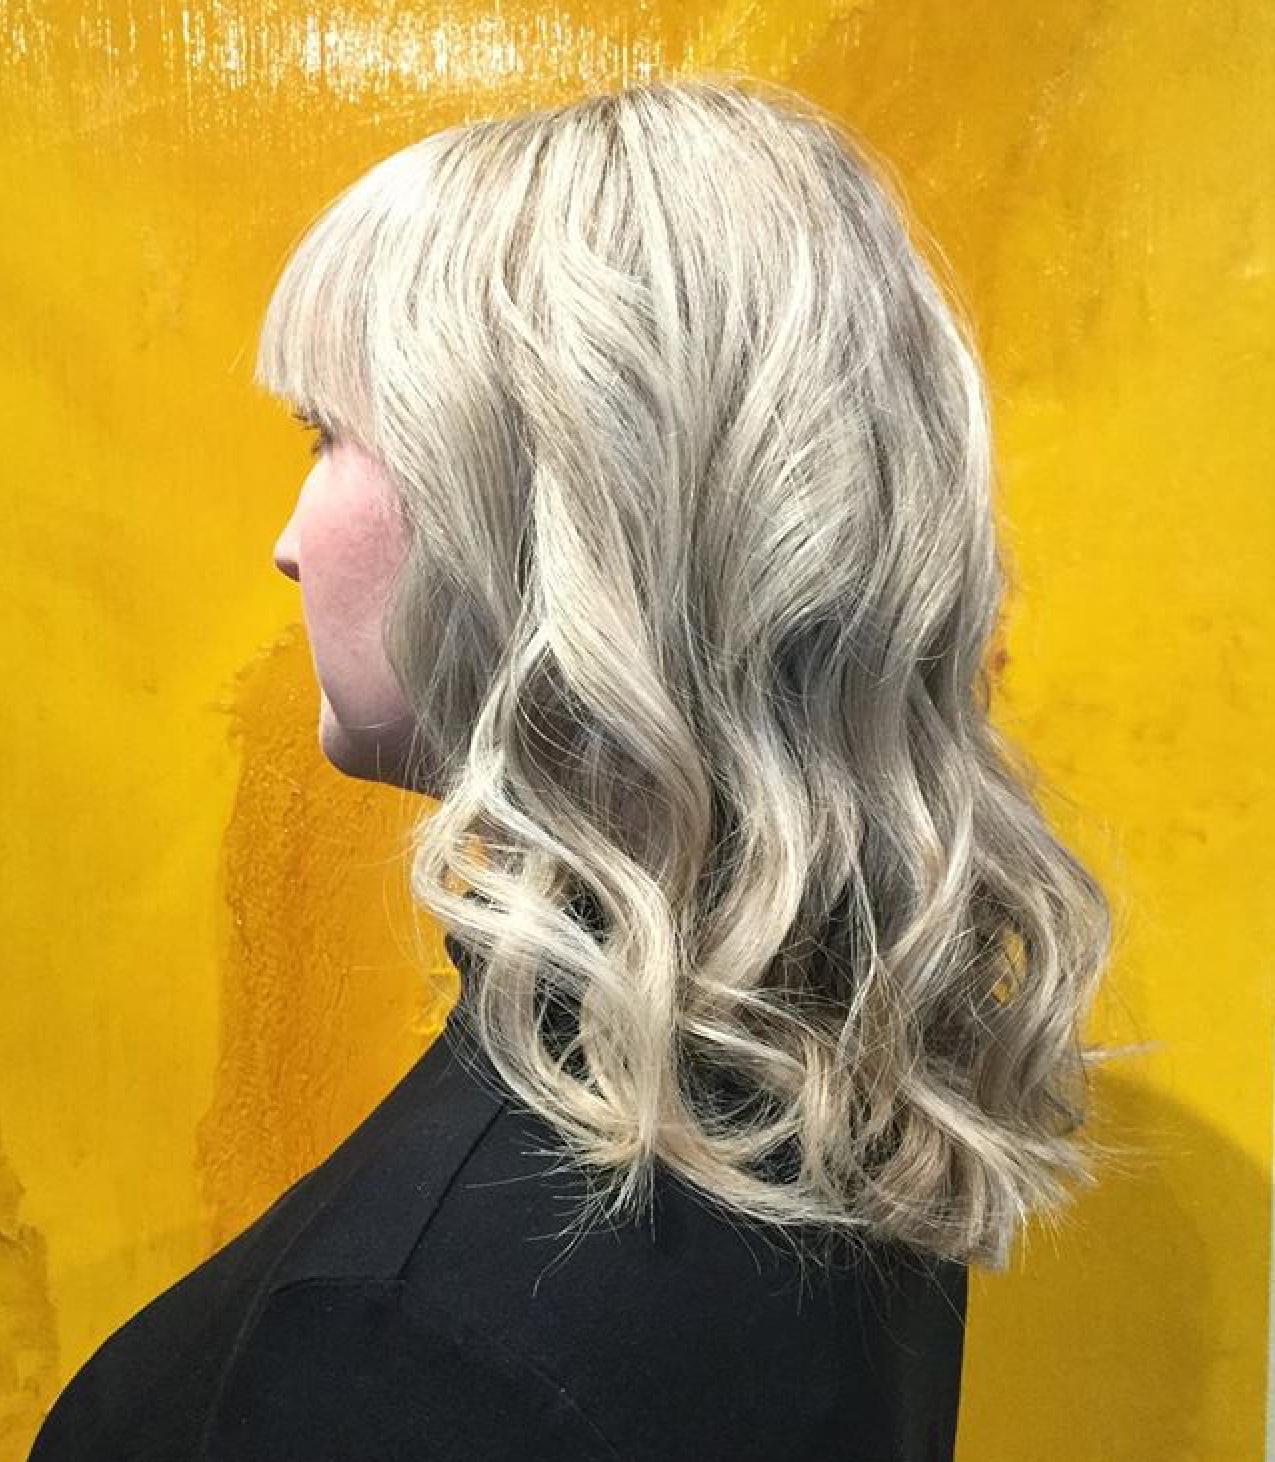 Long Blonde Hair Curls